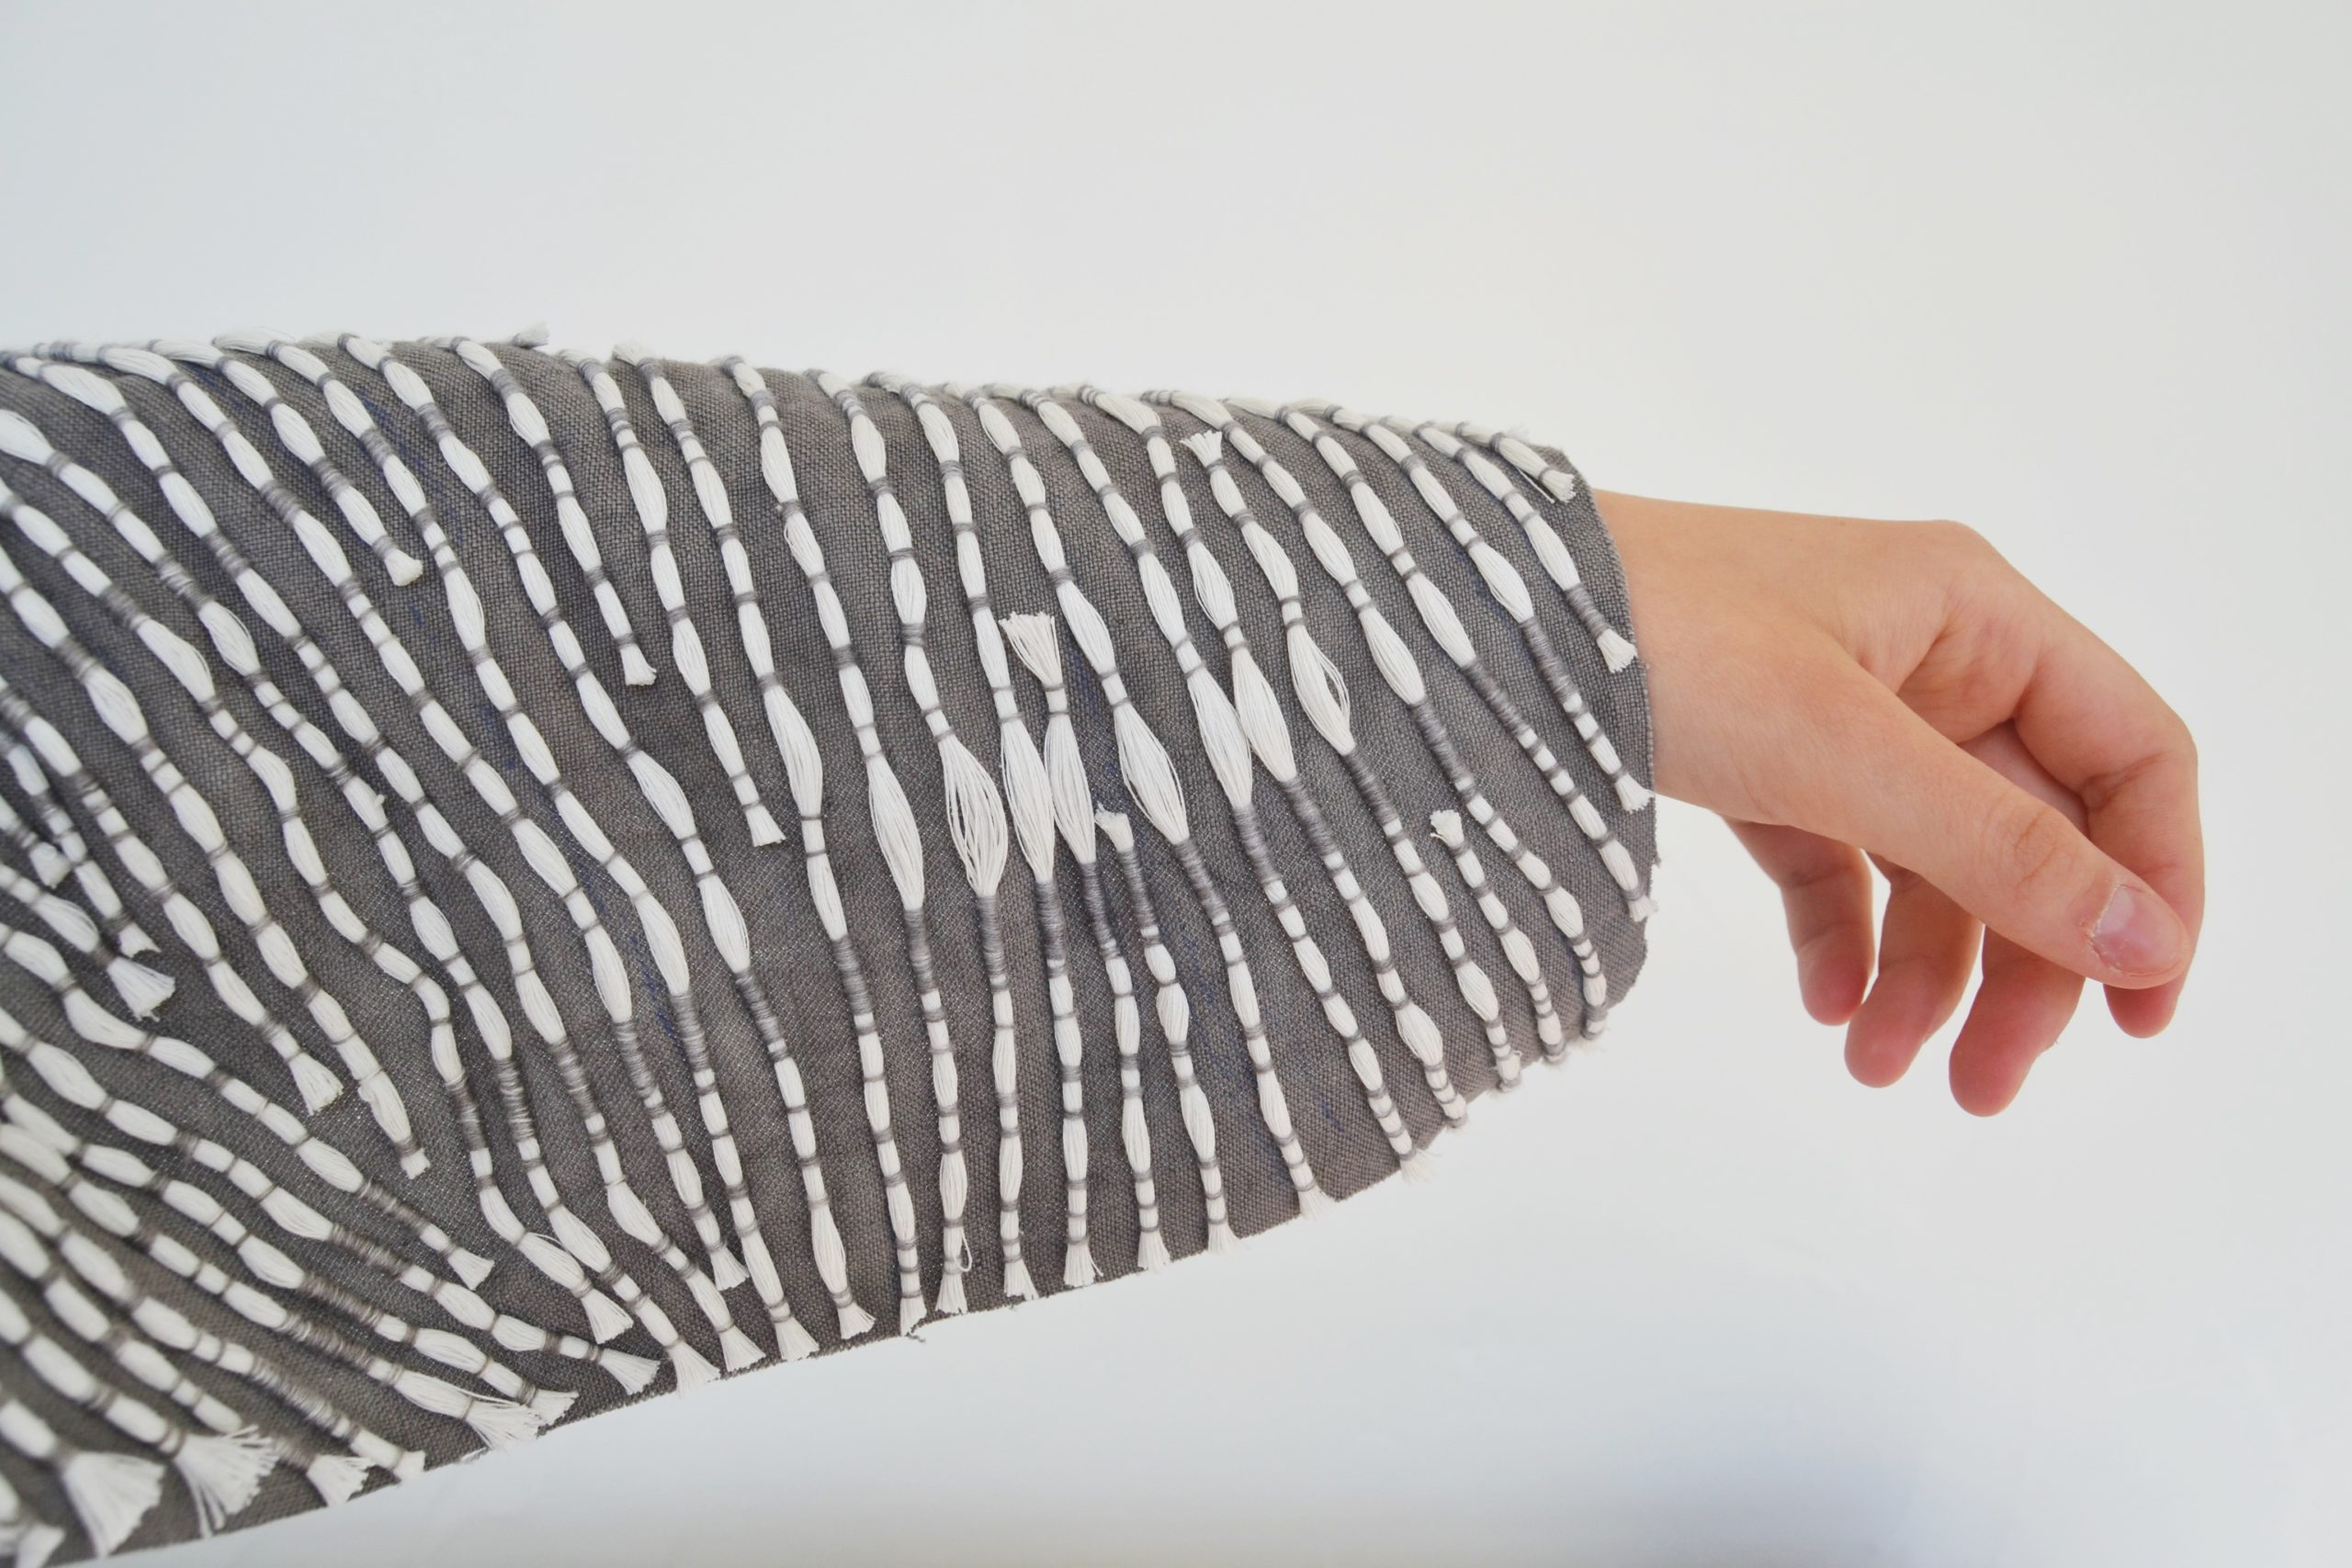 An eco-friendly burial wear design by Francesca Rea.